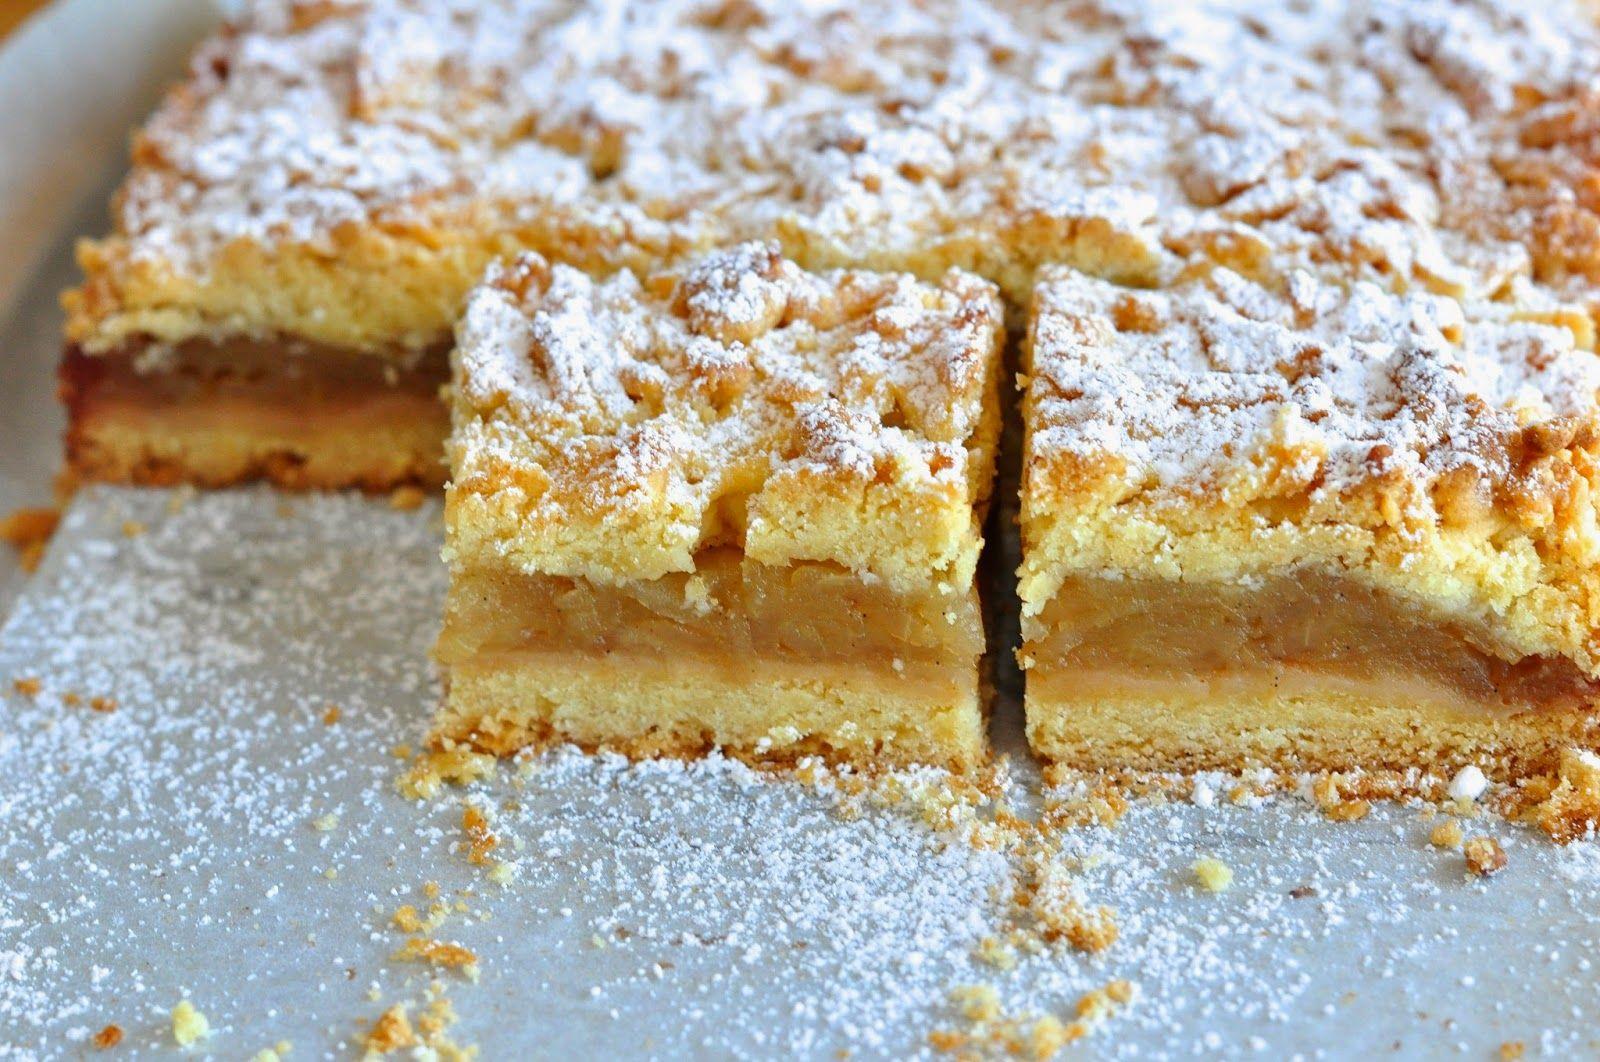 Fabryka Smaku: Szarlotka wg Magdy Gessler | Dessert cake